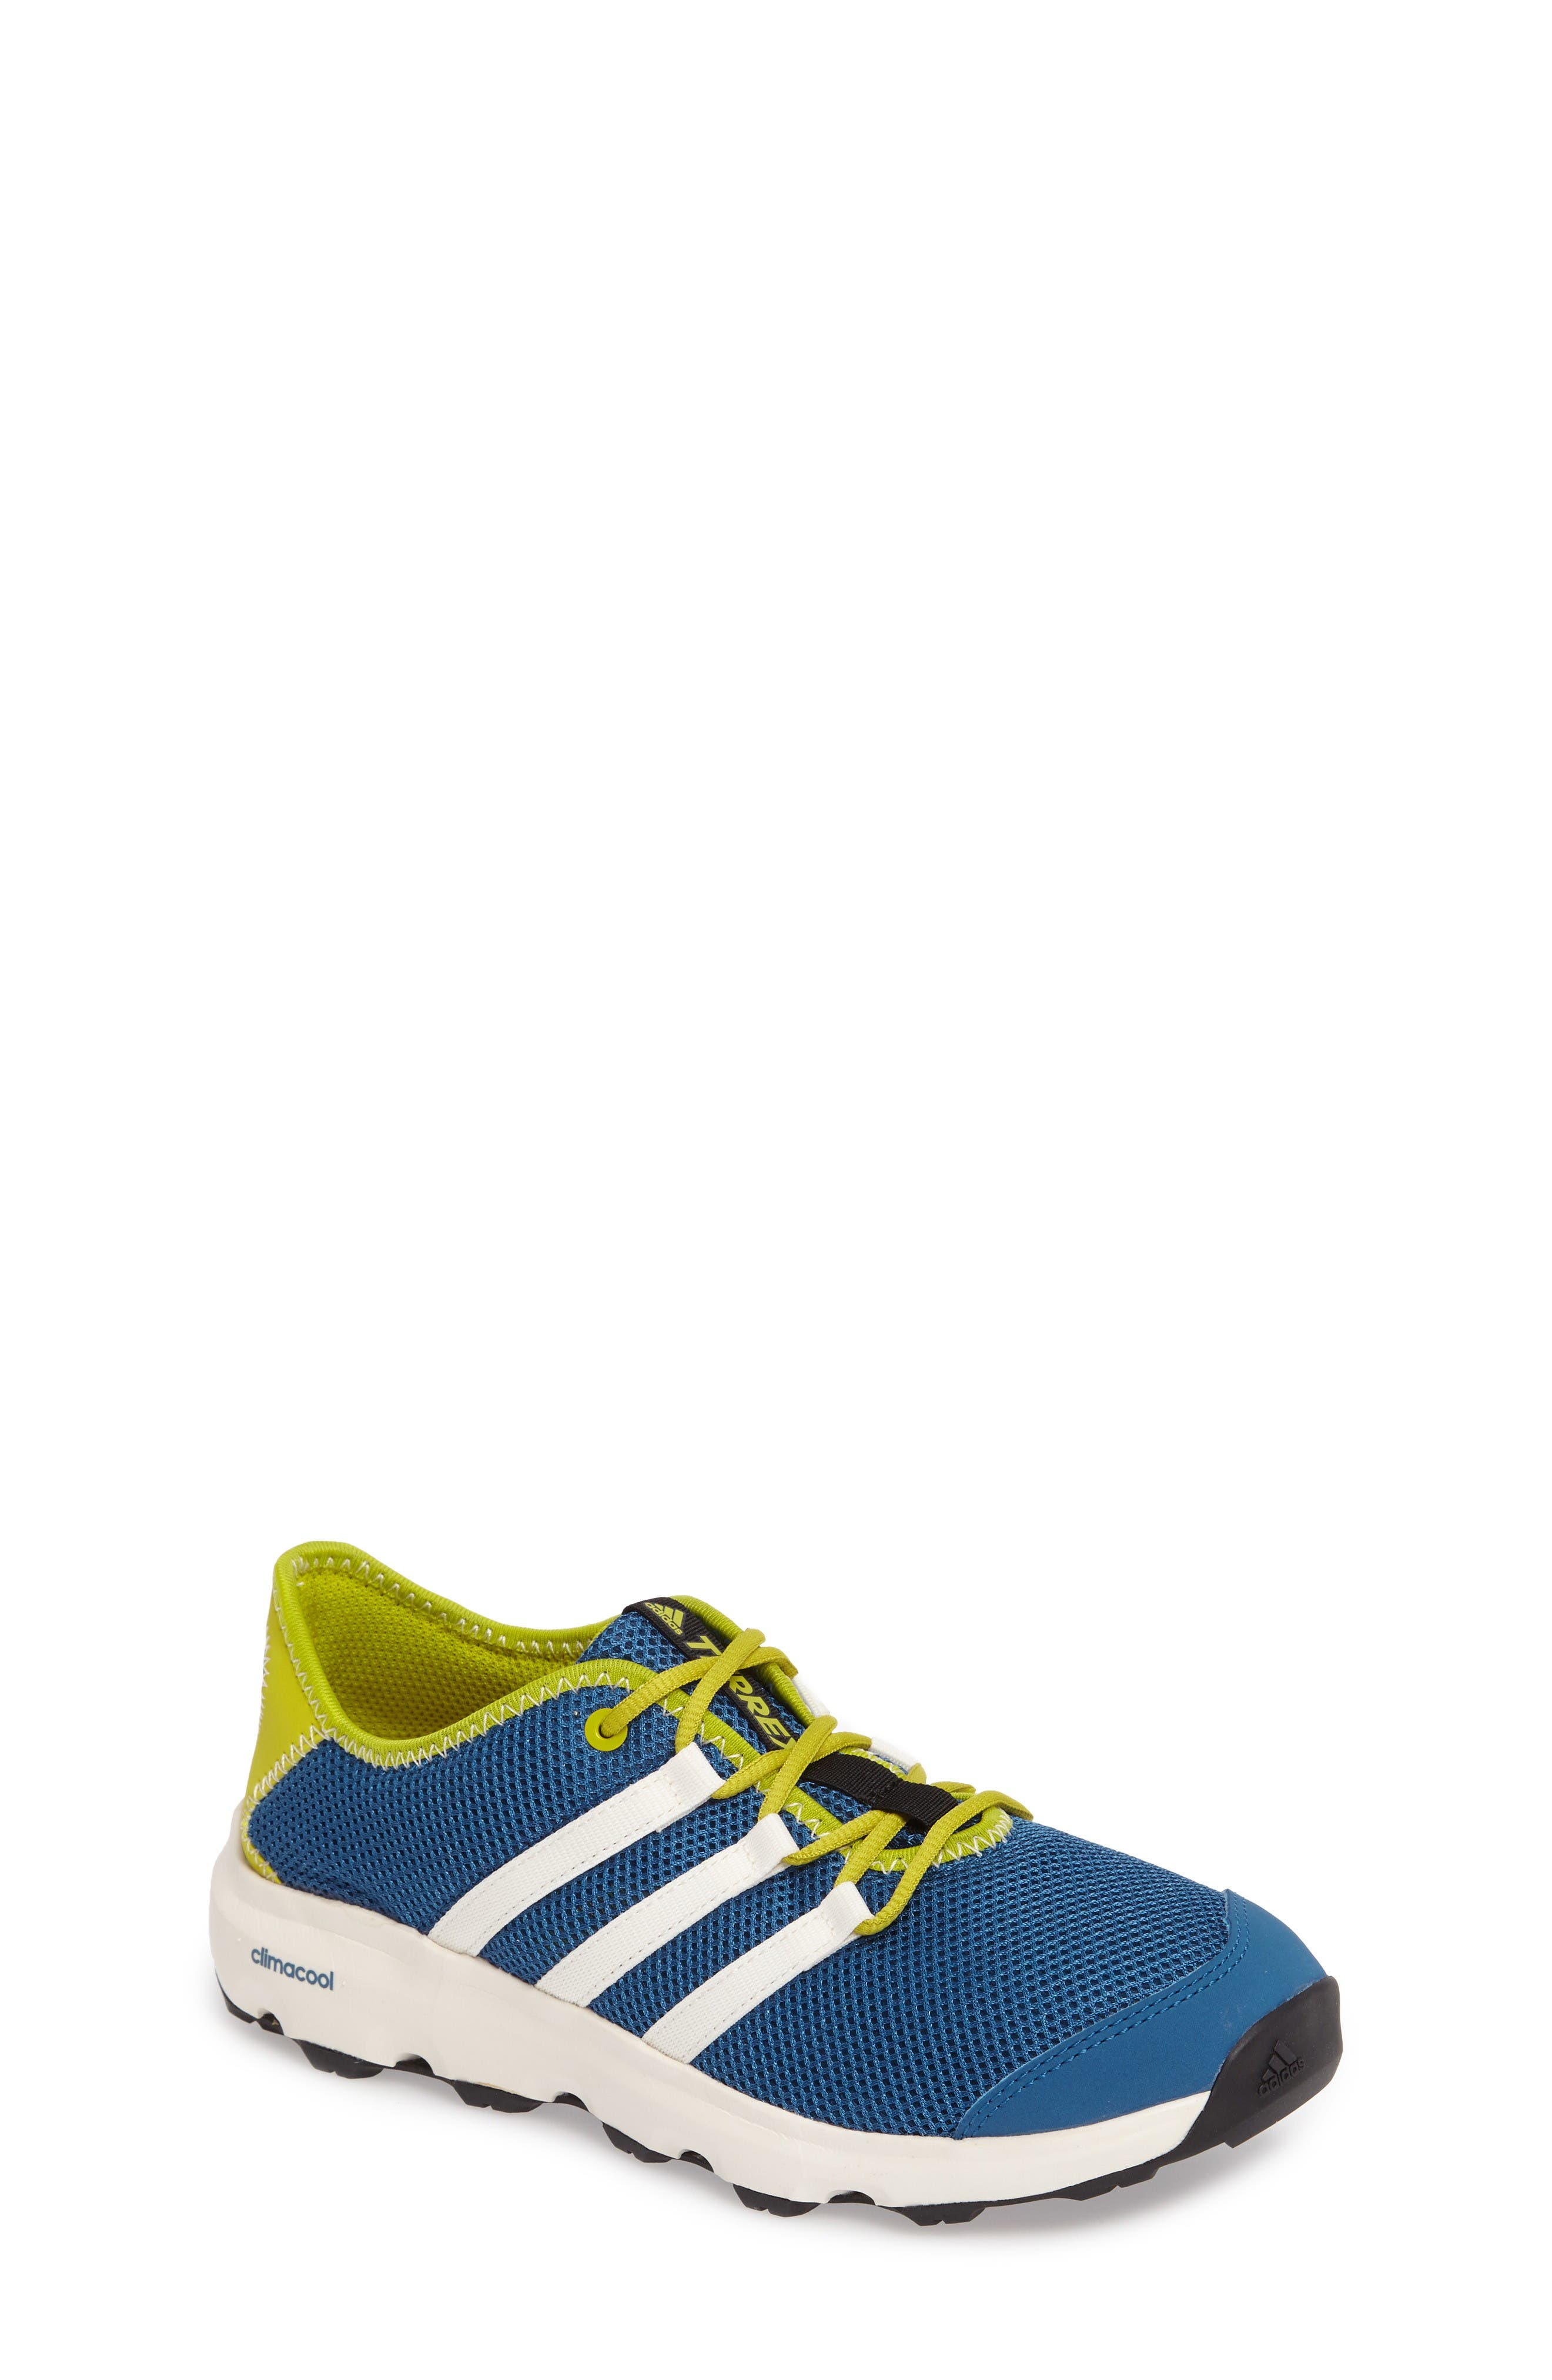 Terrex Climacool<sup>®</sup> Voyager Sneaker,                             Main thumbnail 1, color,                             Core Blue/ Chalk White/ Lime